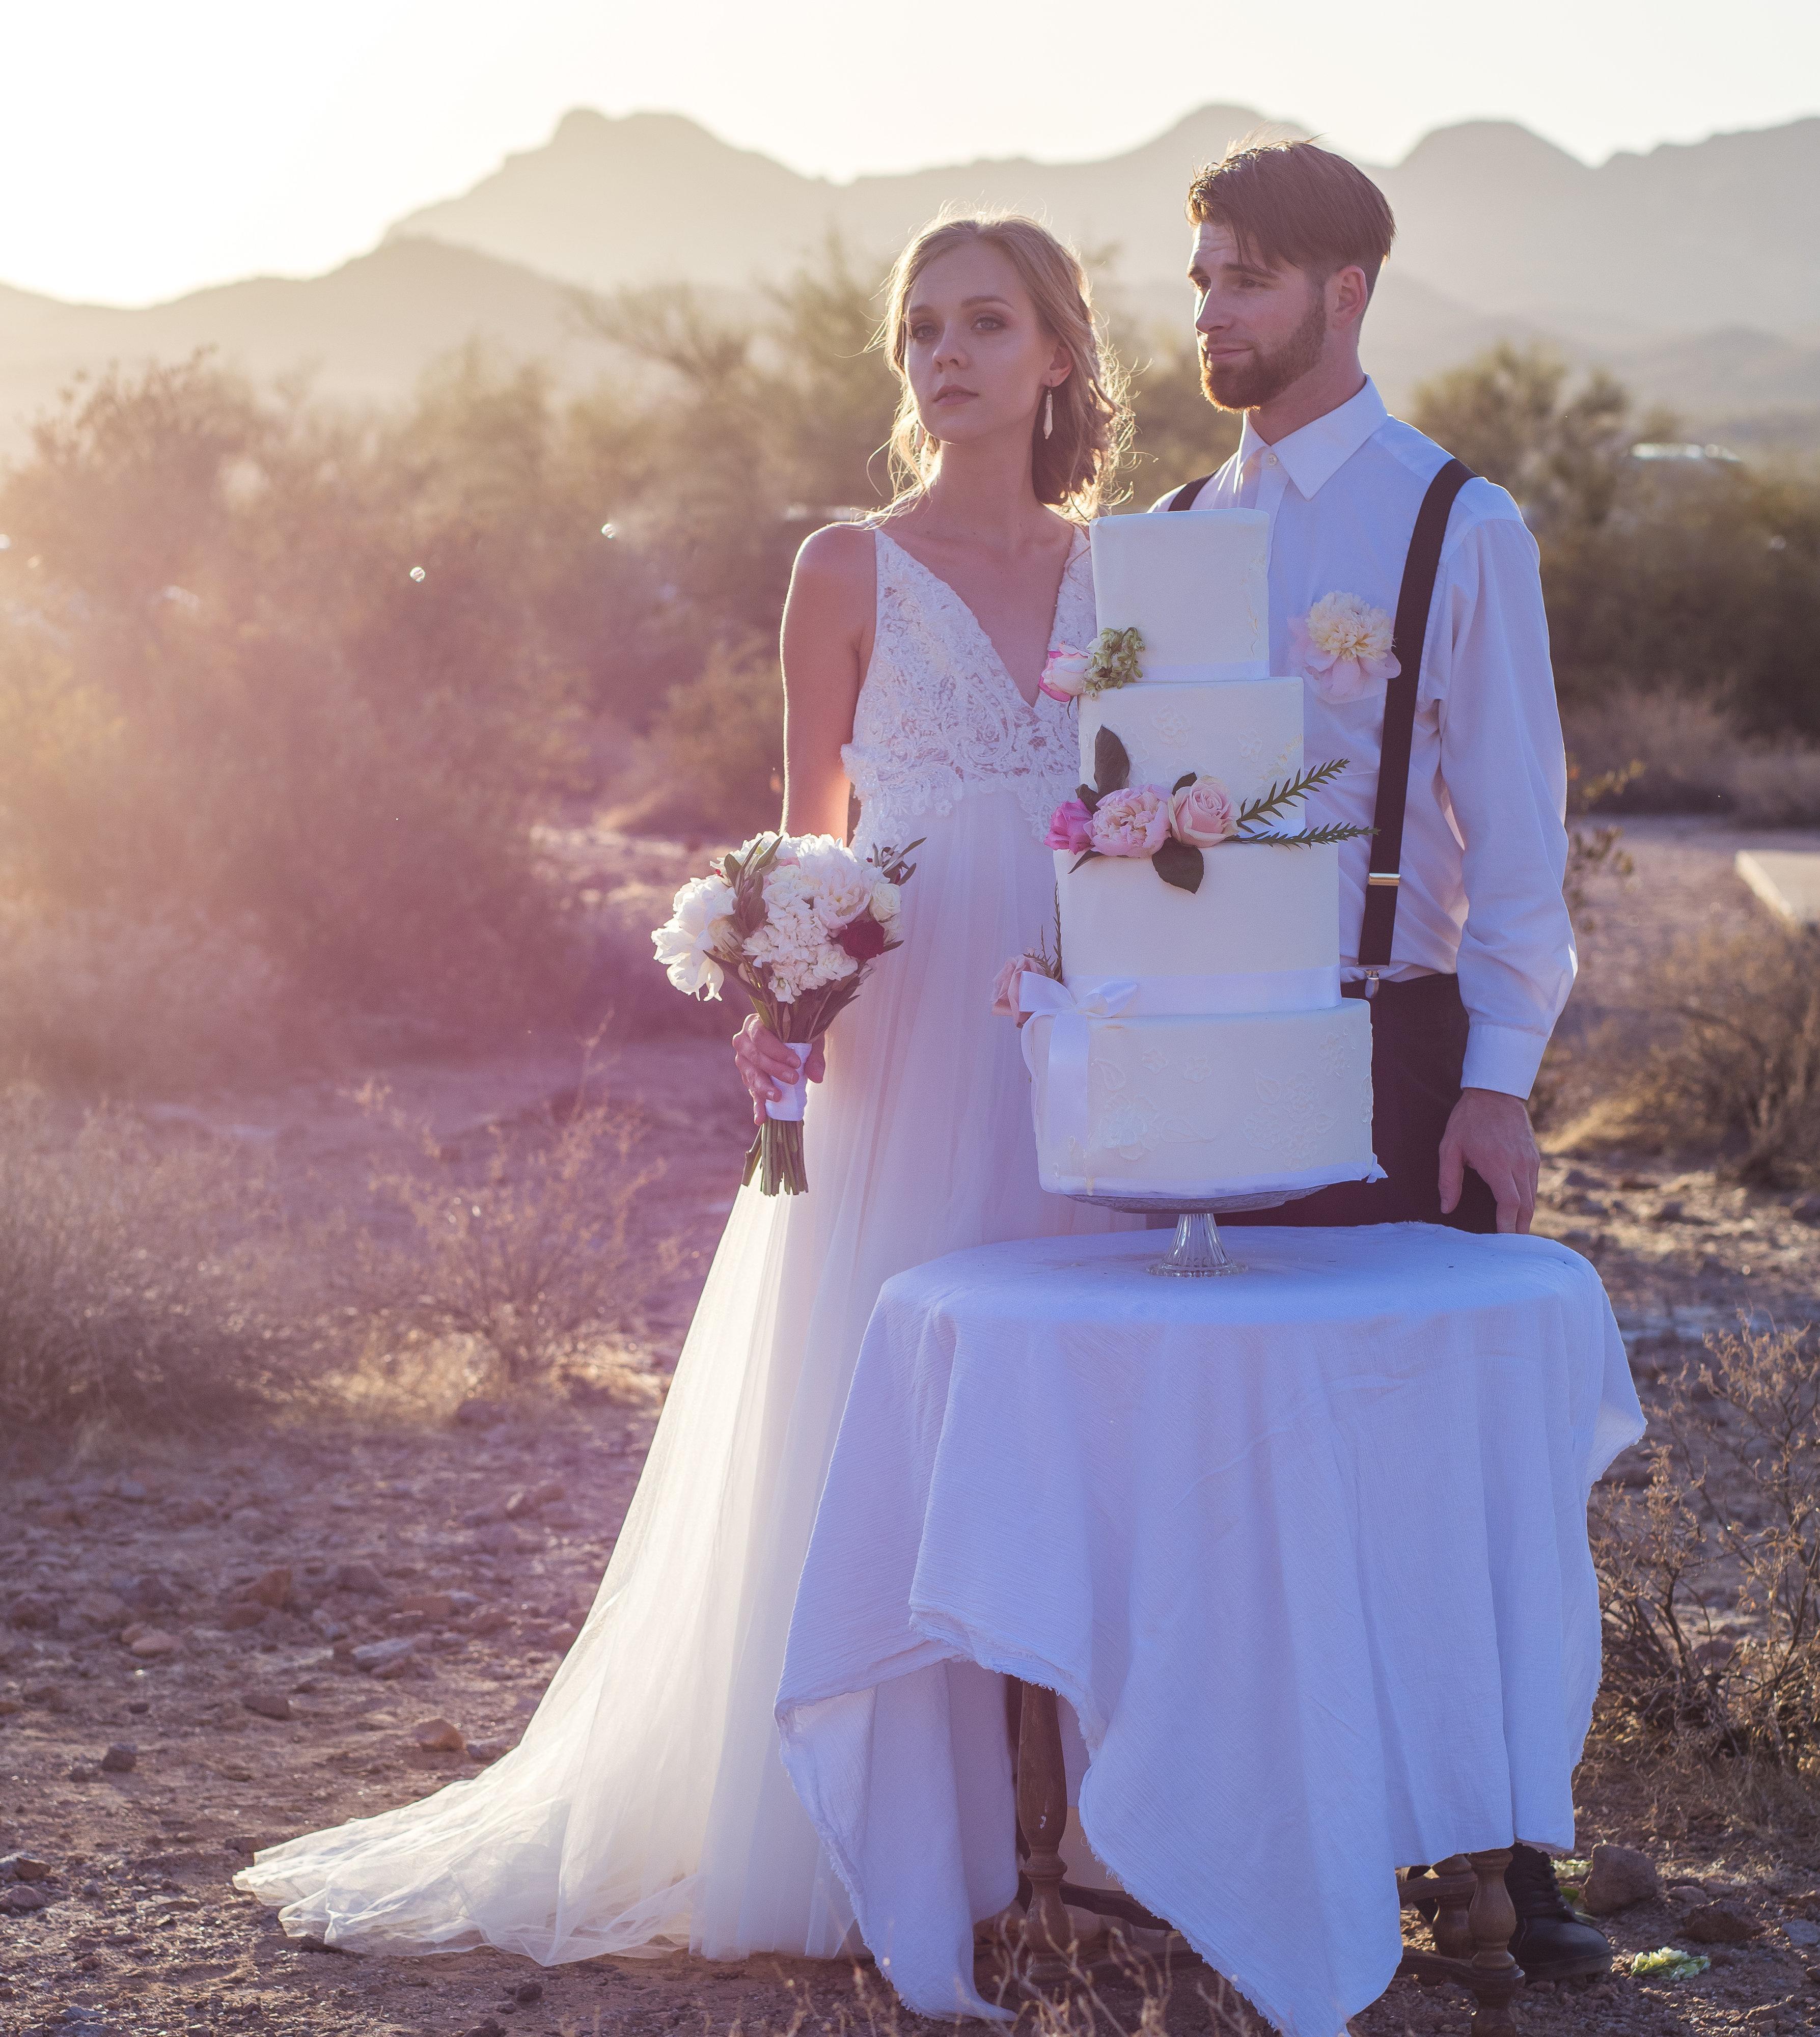 Classic 4 Tier White Wedding Cake